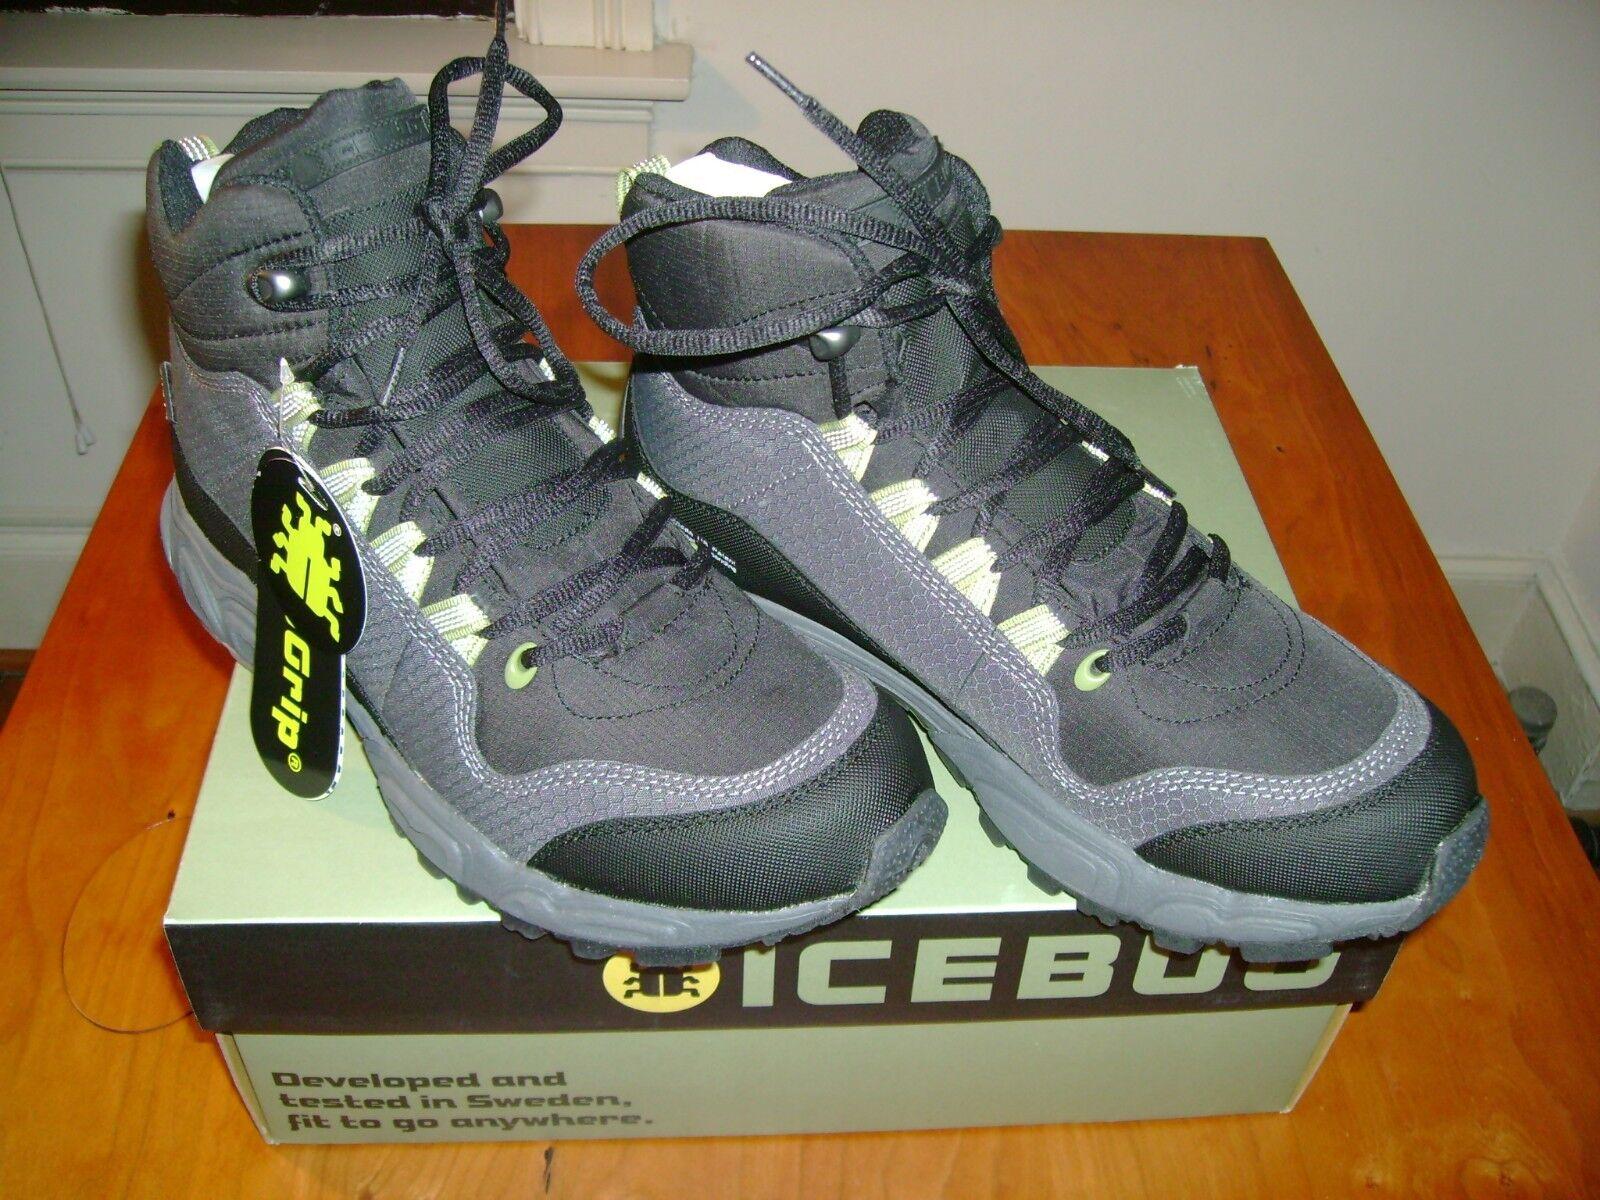 Icebug Stord BUGrip Hiking Boots, Men's 7.5, New